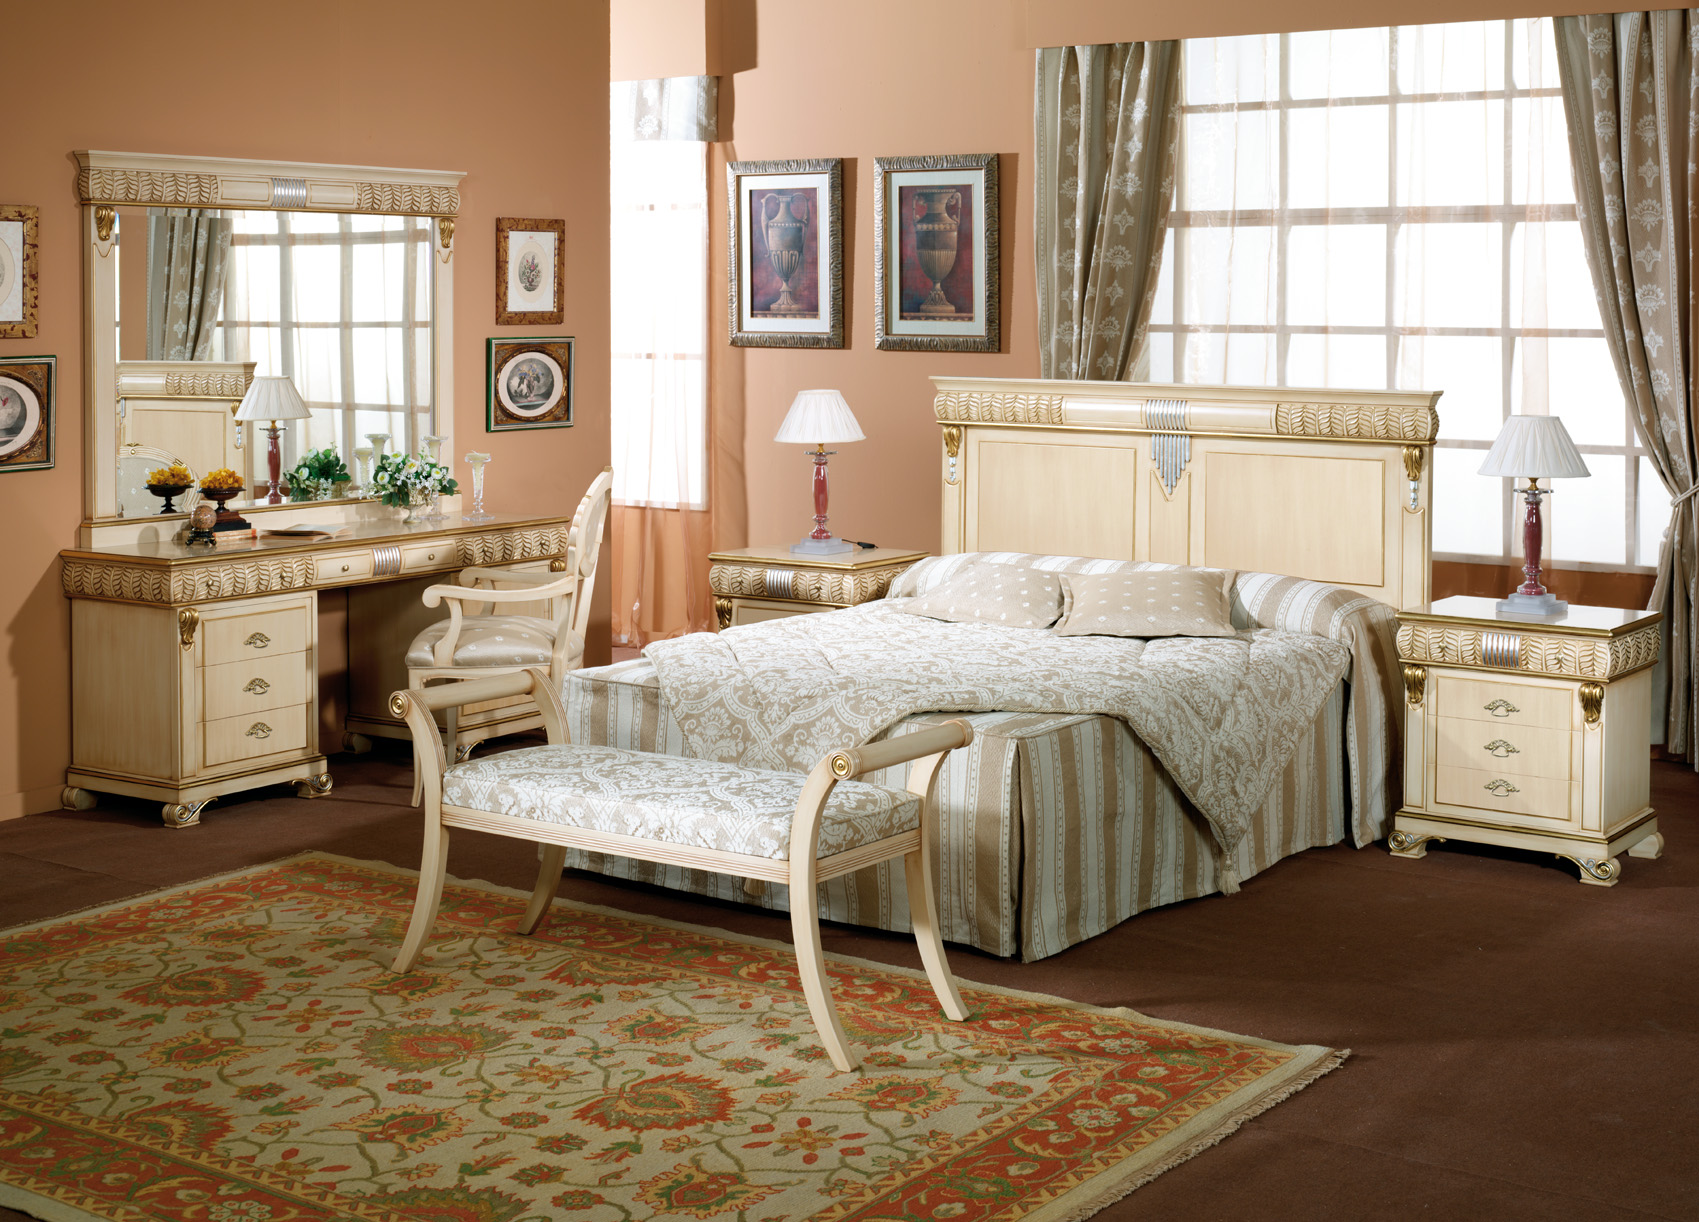 dormitorios de matrimonio de estilo clasico (52)